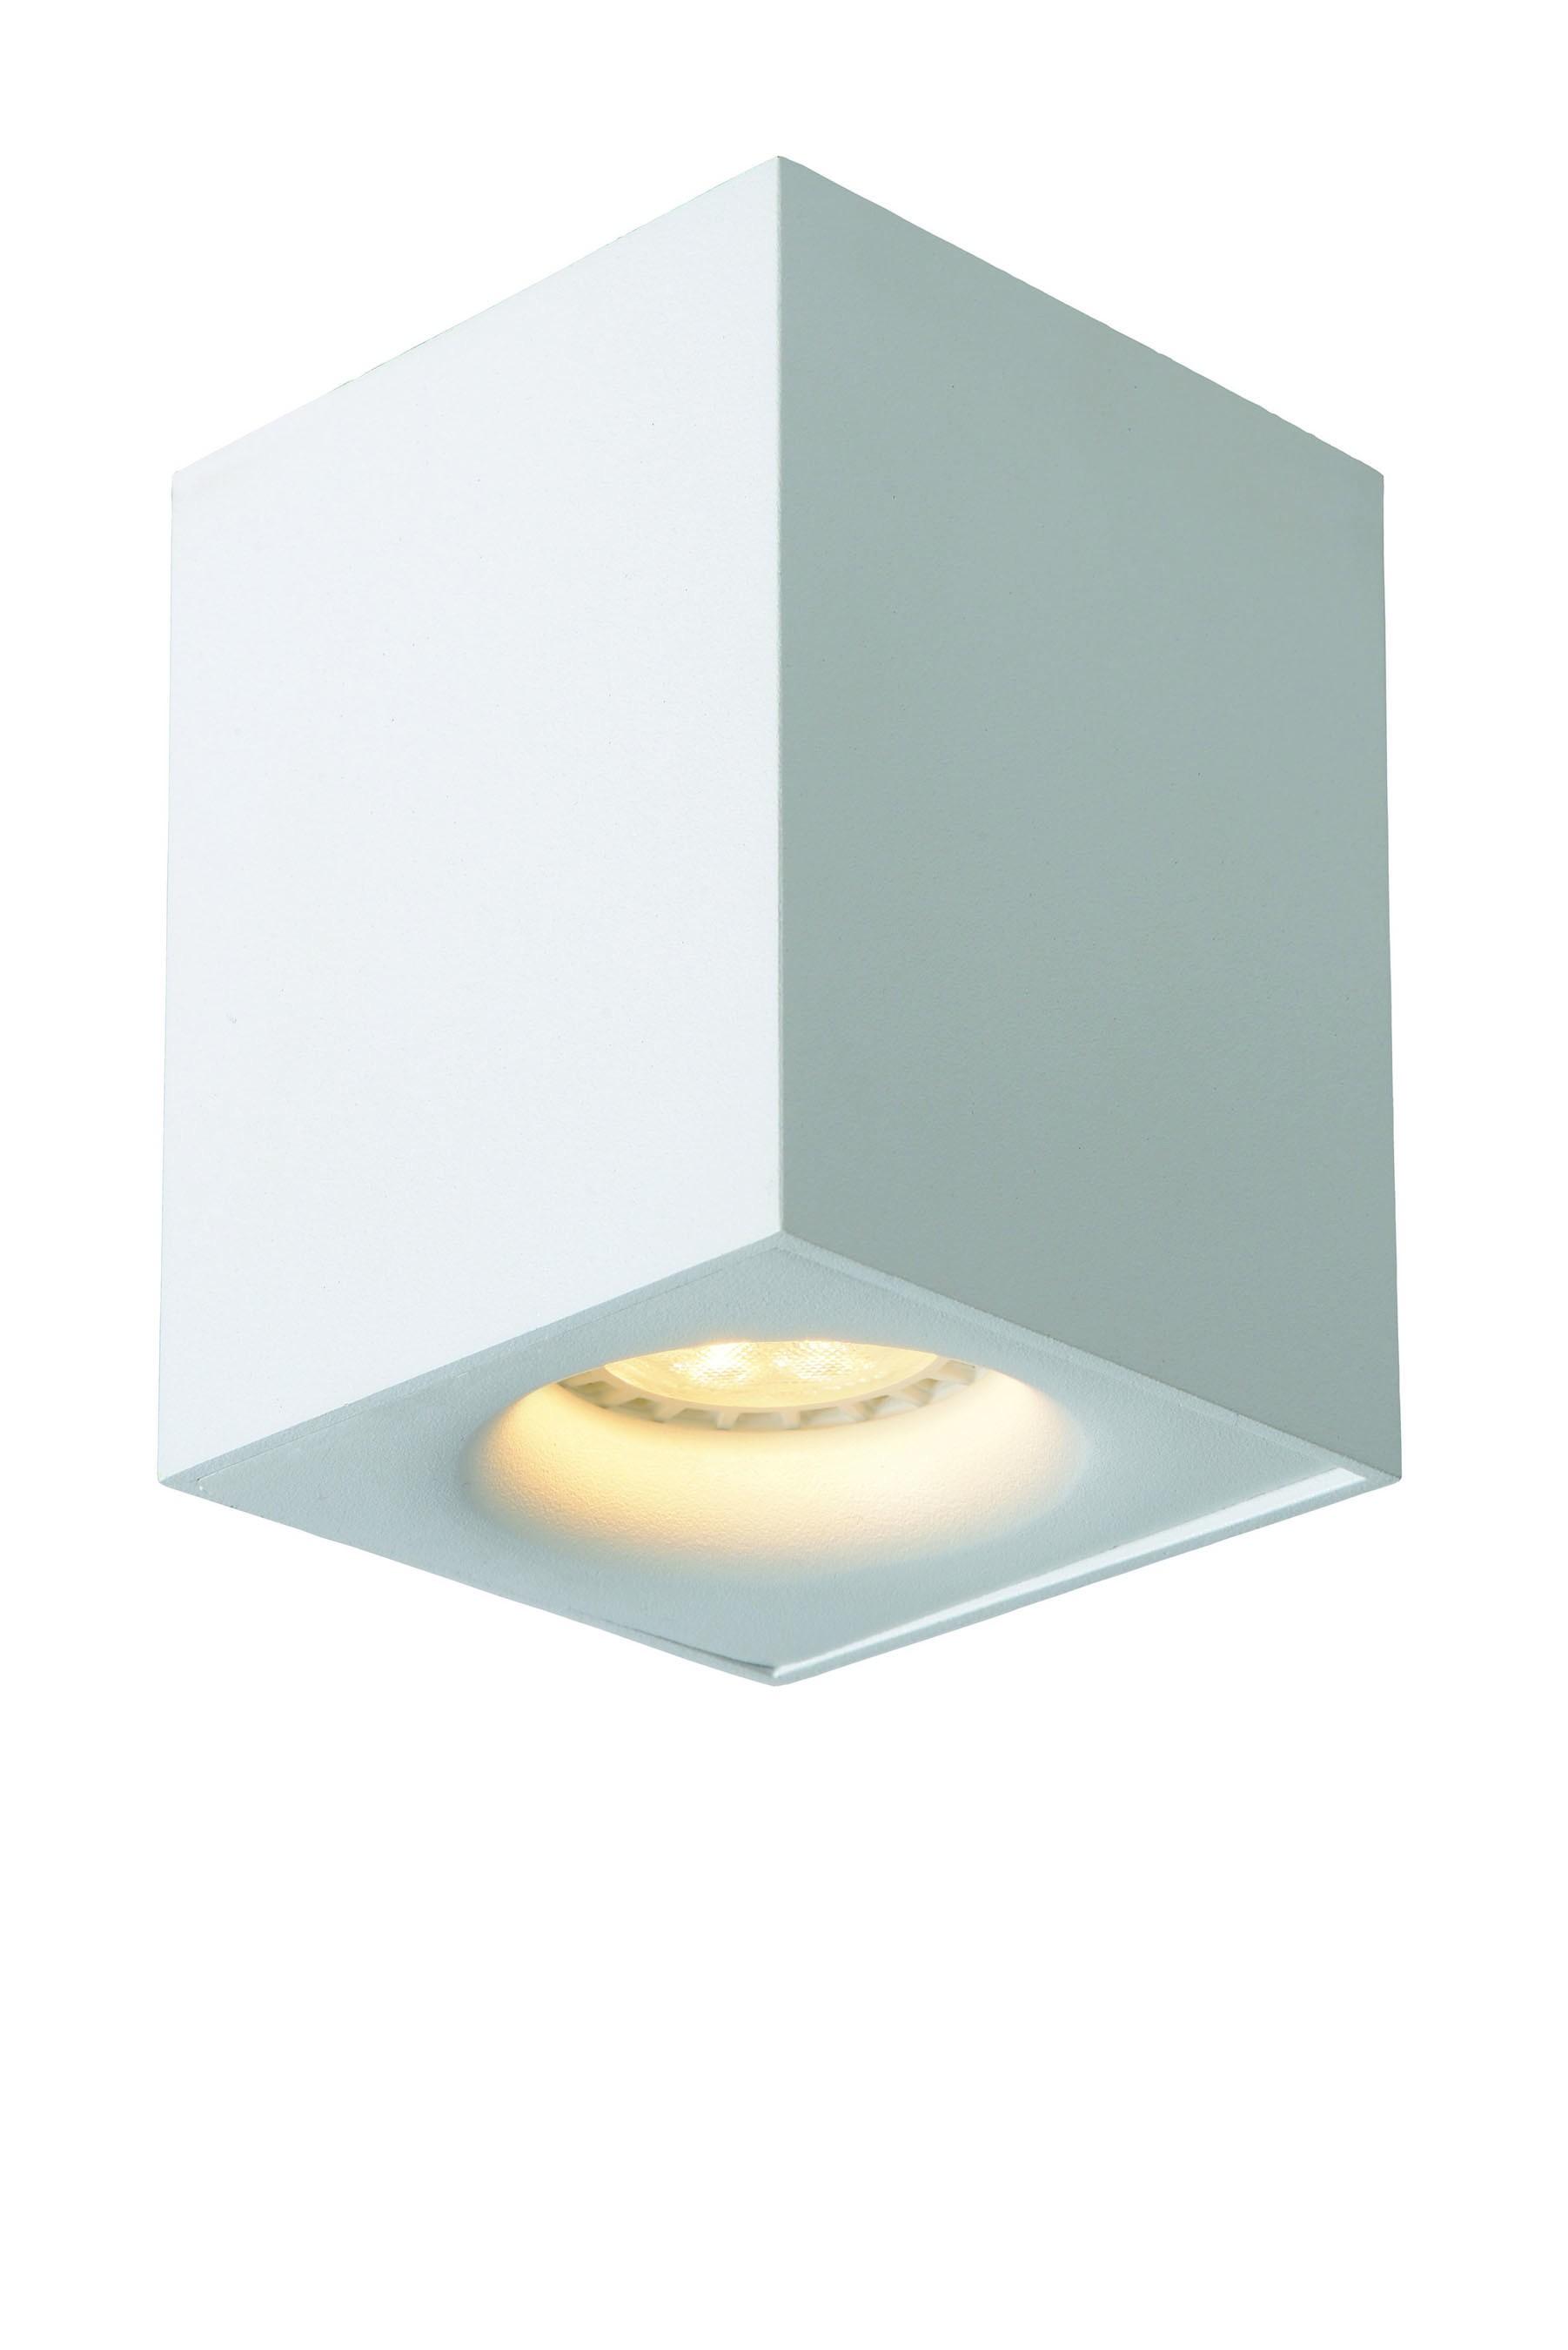 Bandeau Led Encastrable Plafond tioben led spot plafond led dim. gu10 1x5w 3000k blanc